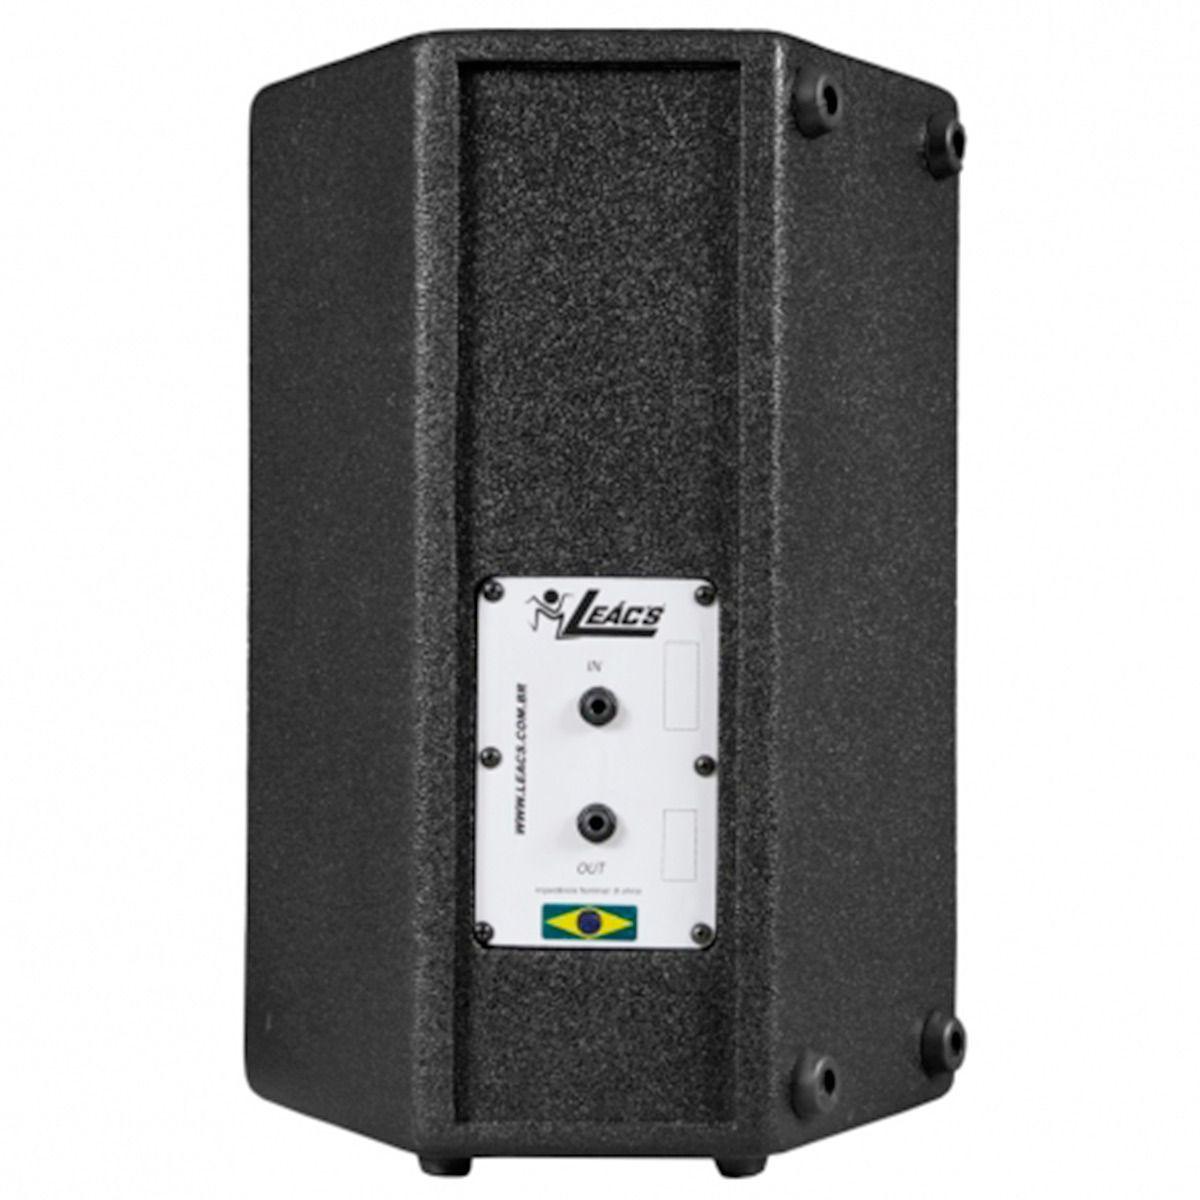 Kit 2 Caixa Acústica Leacs Fit160 + Amplificador Oneal Op1700